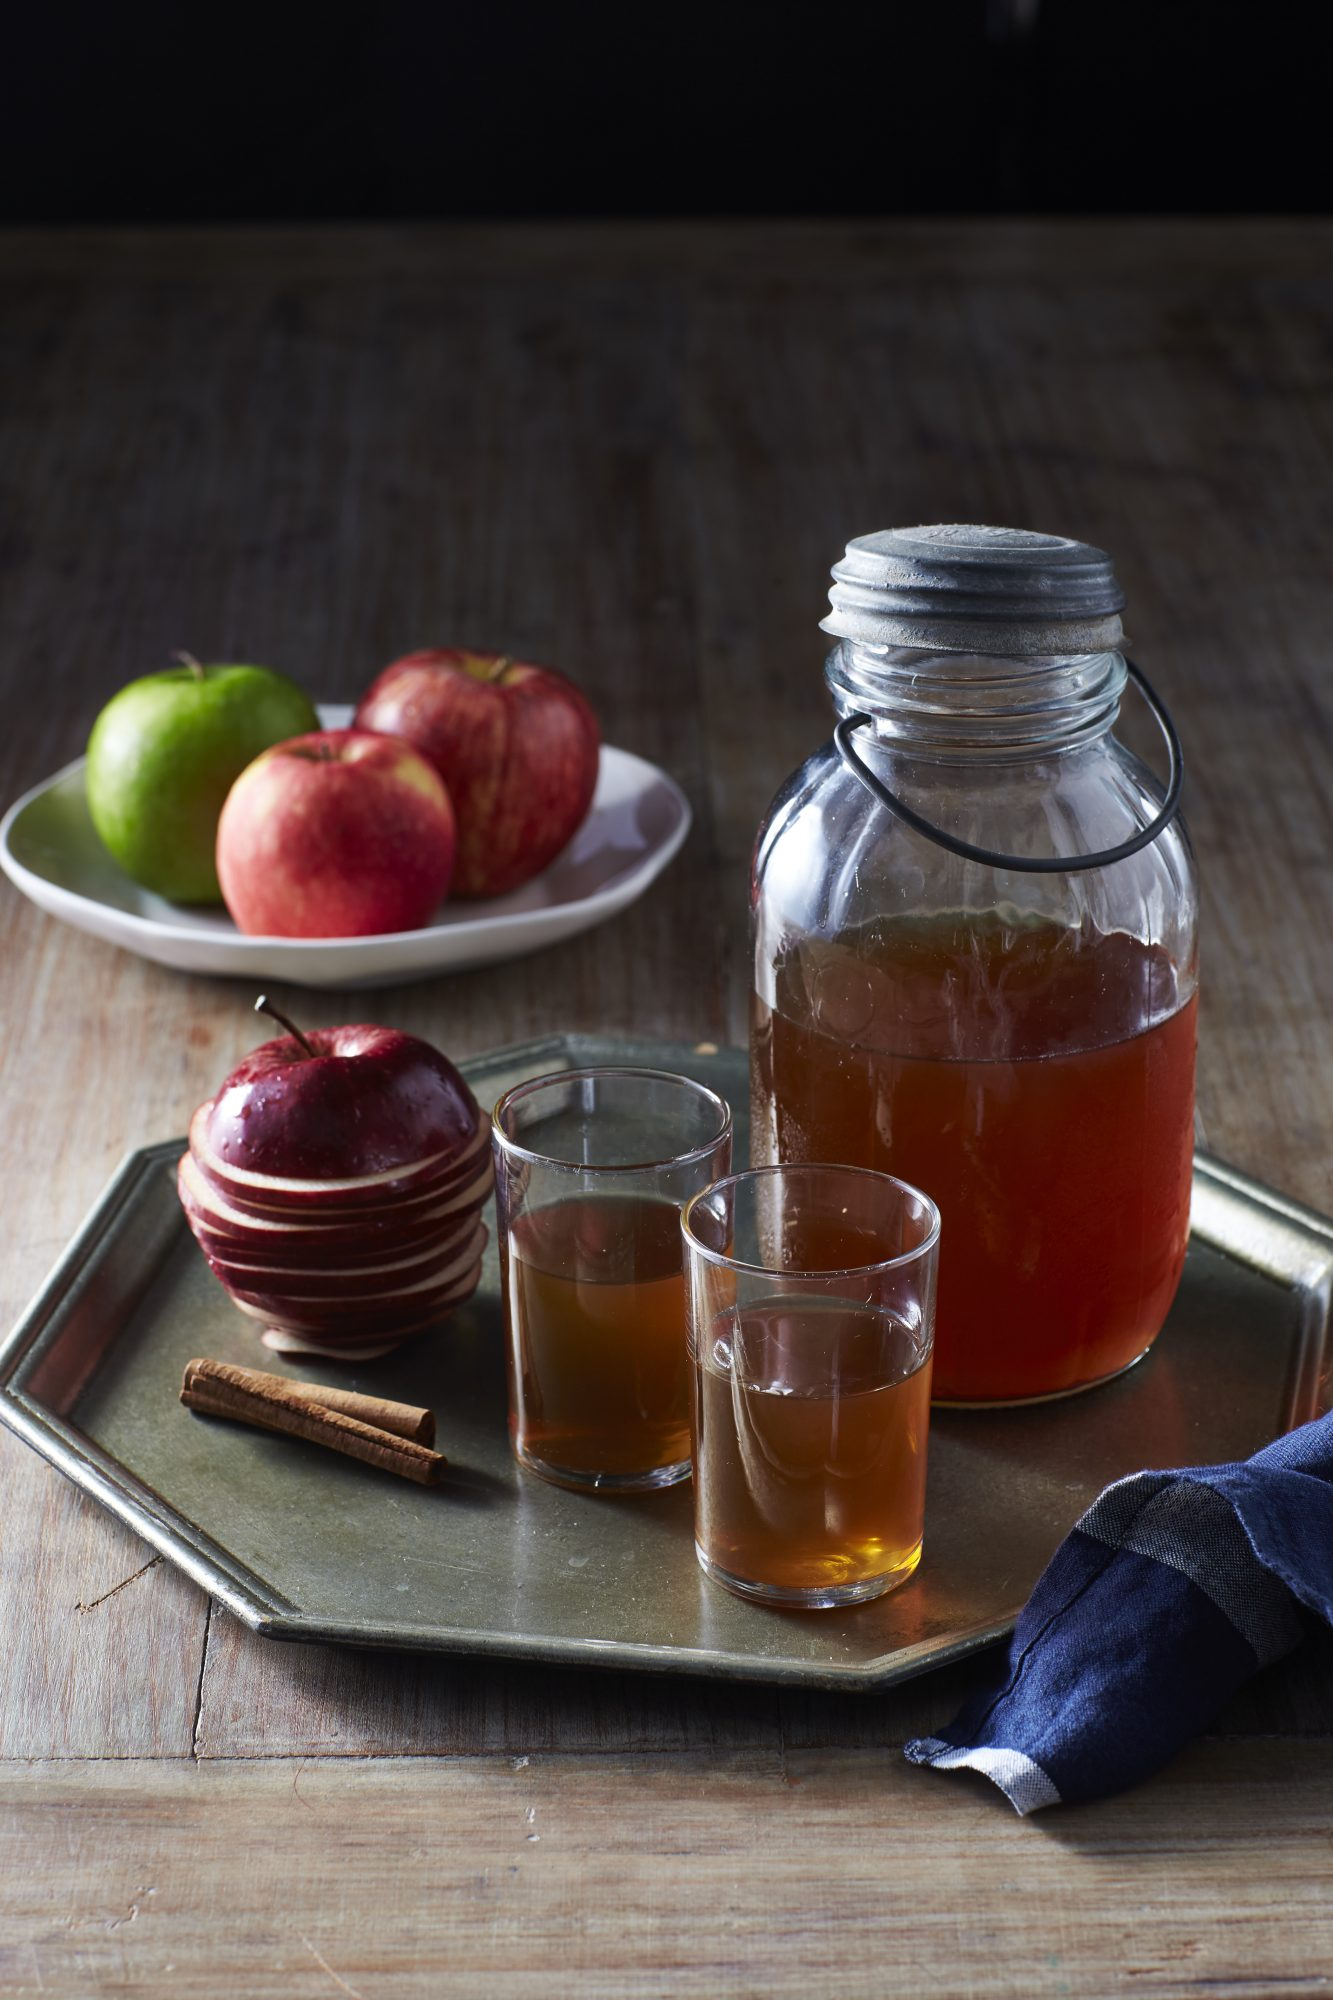 mr-apple-pie-moonshine-image-2